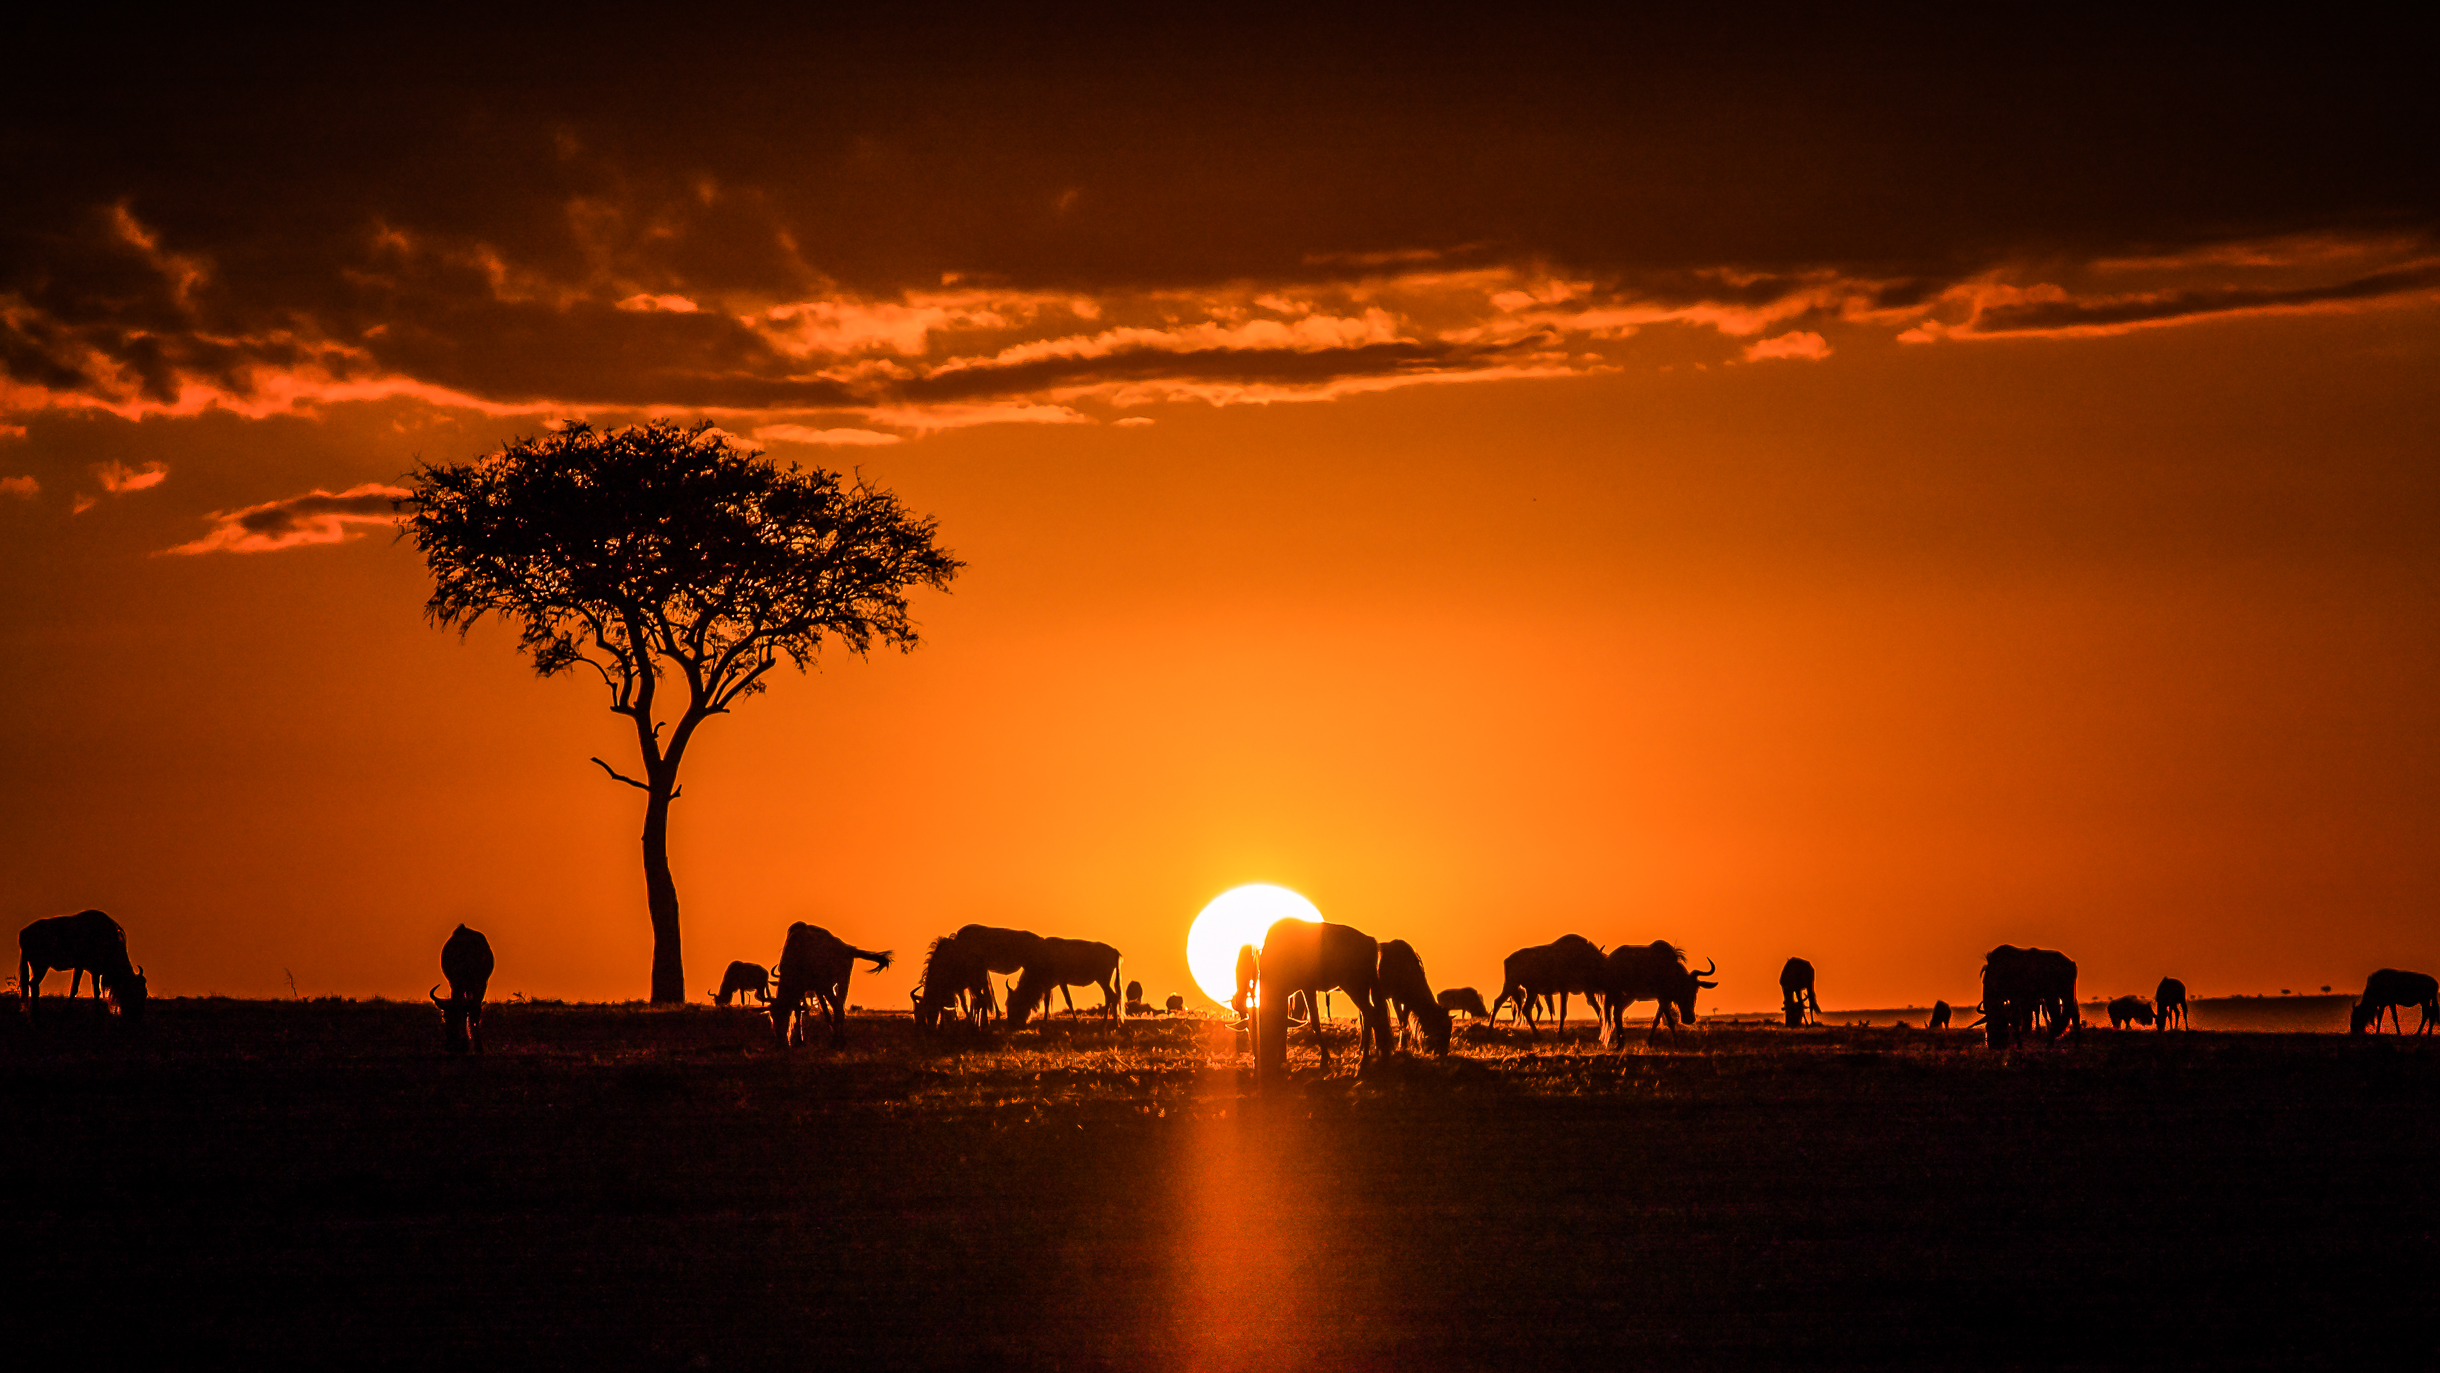 Sunrise in the Maasai Mara (Illustration) - Ancient History Encyclopedia